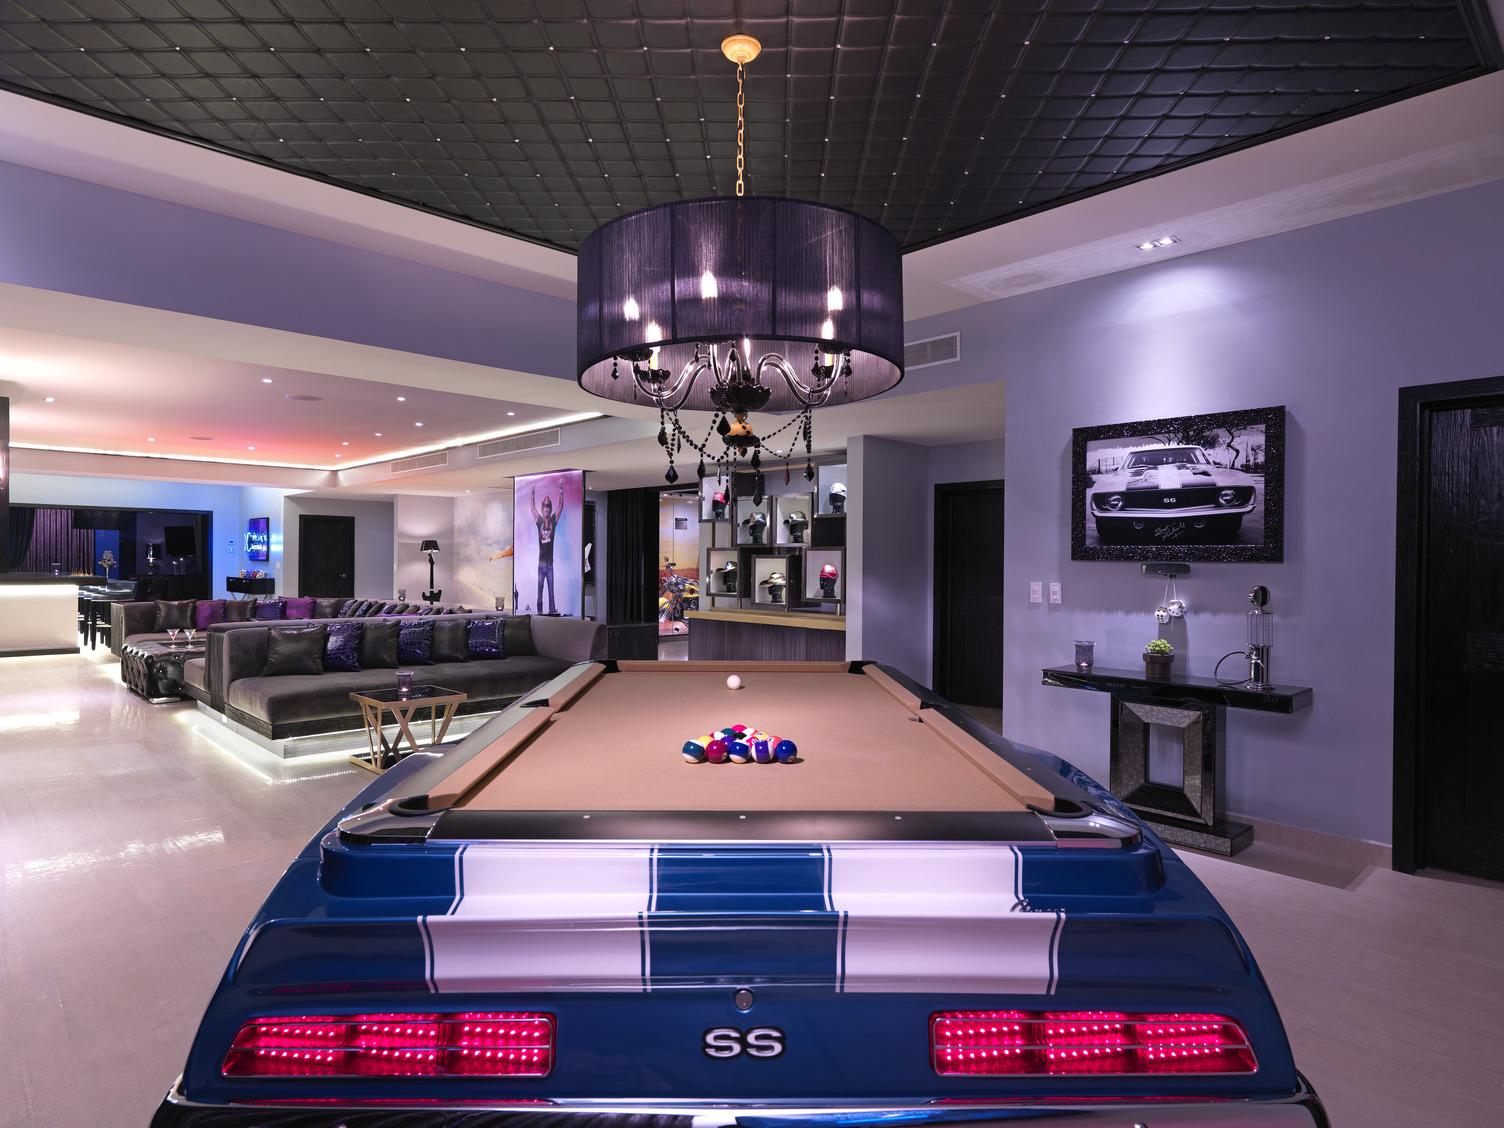 Travel Agency All-Inclusive Resort Heaven at Hard Rock Hotel Riviera Maya 29